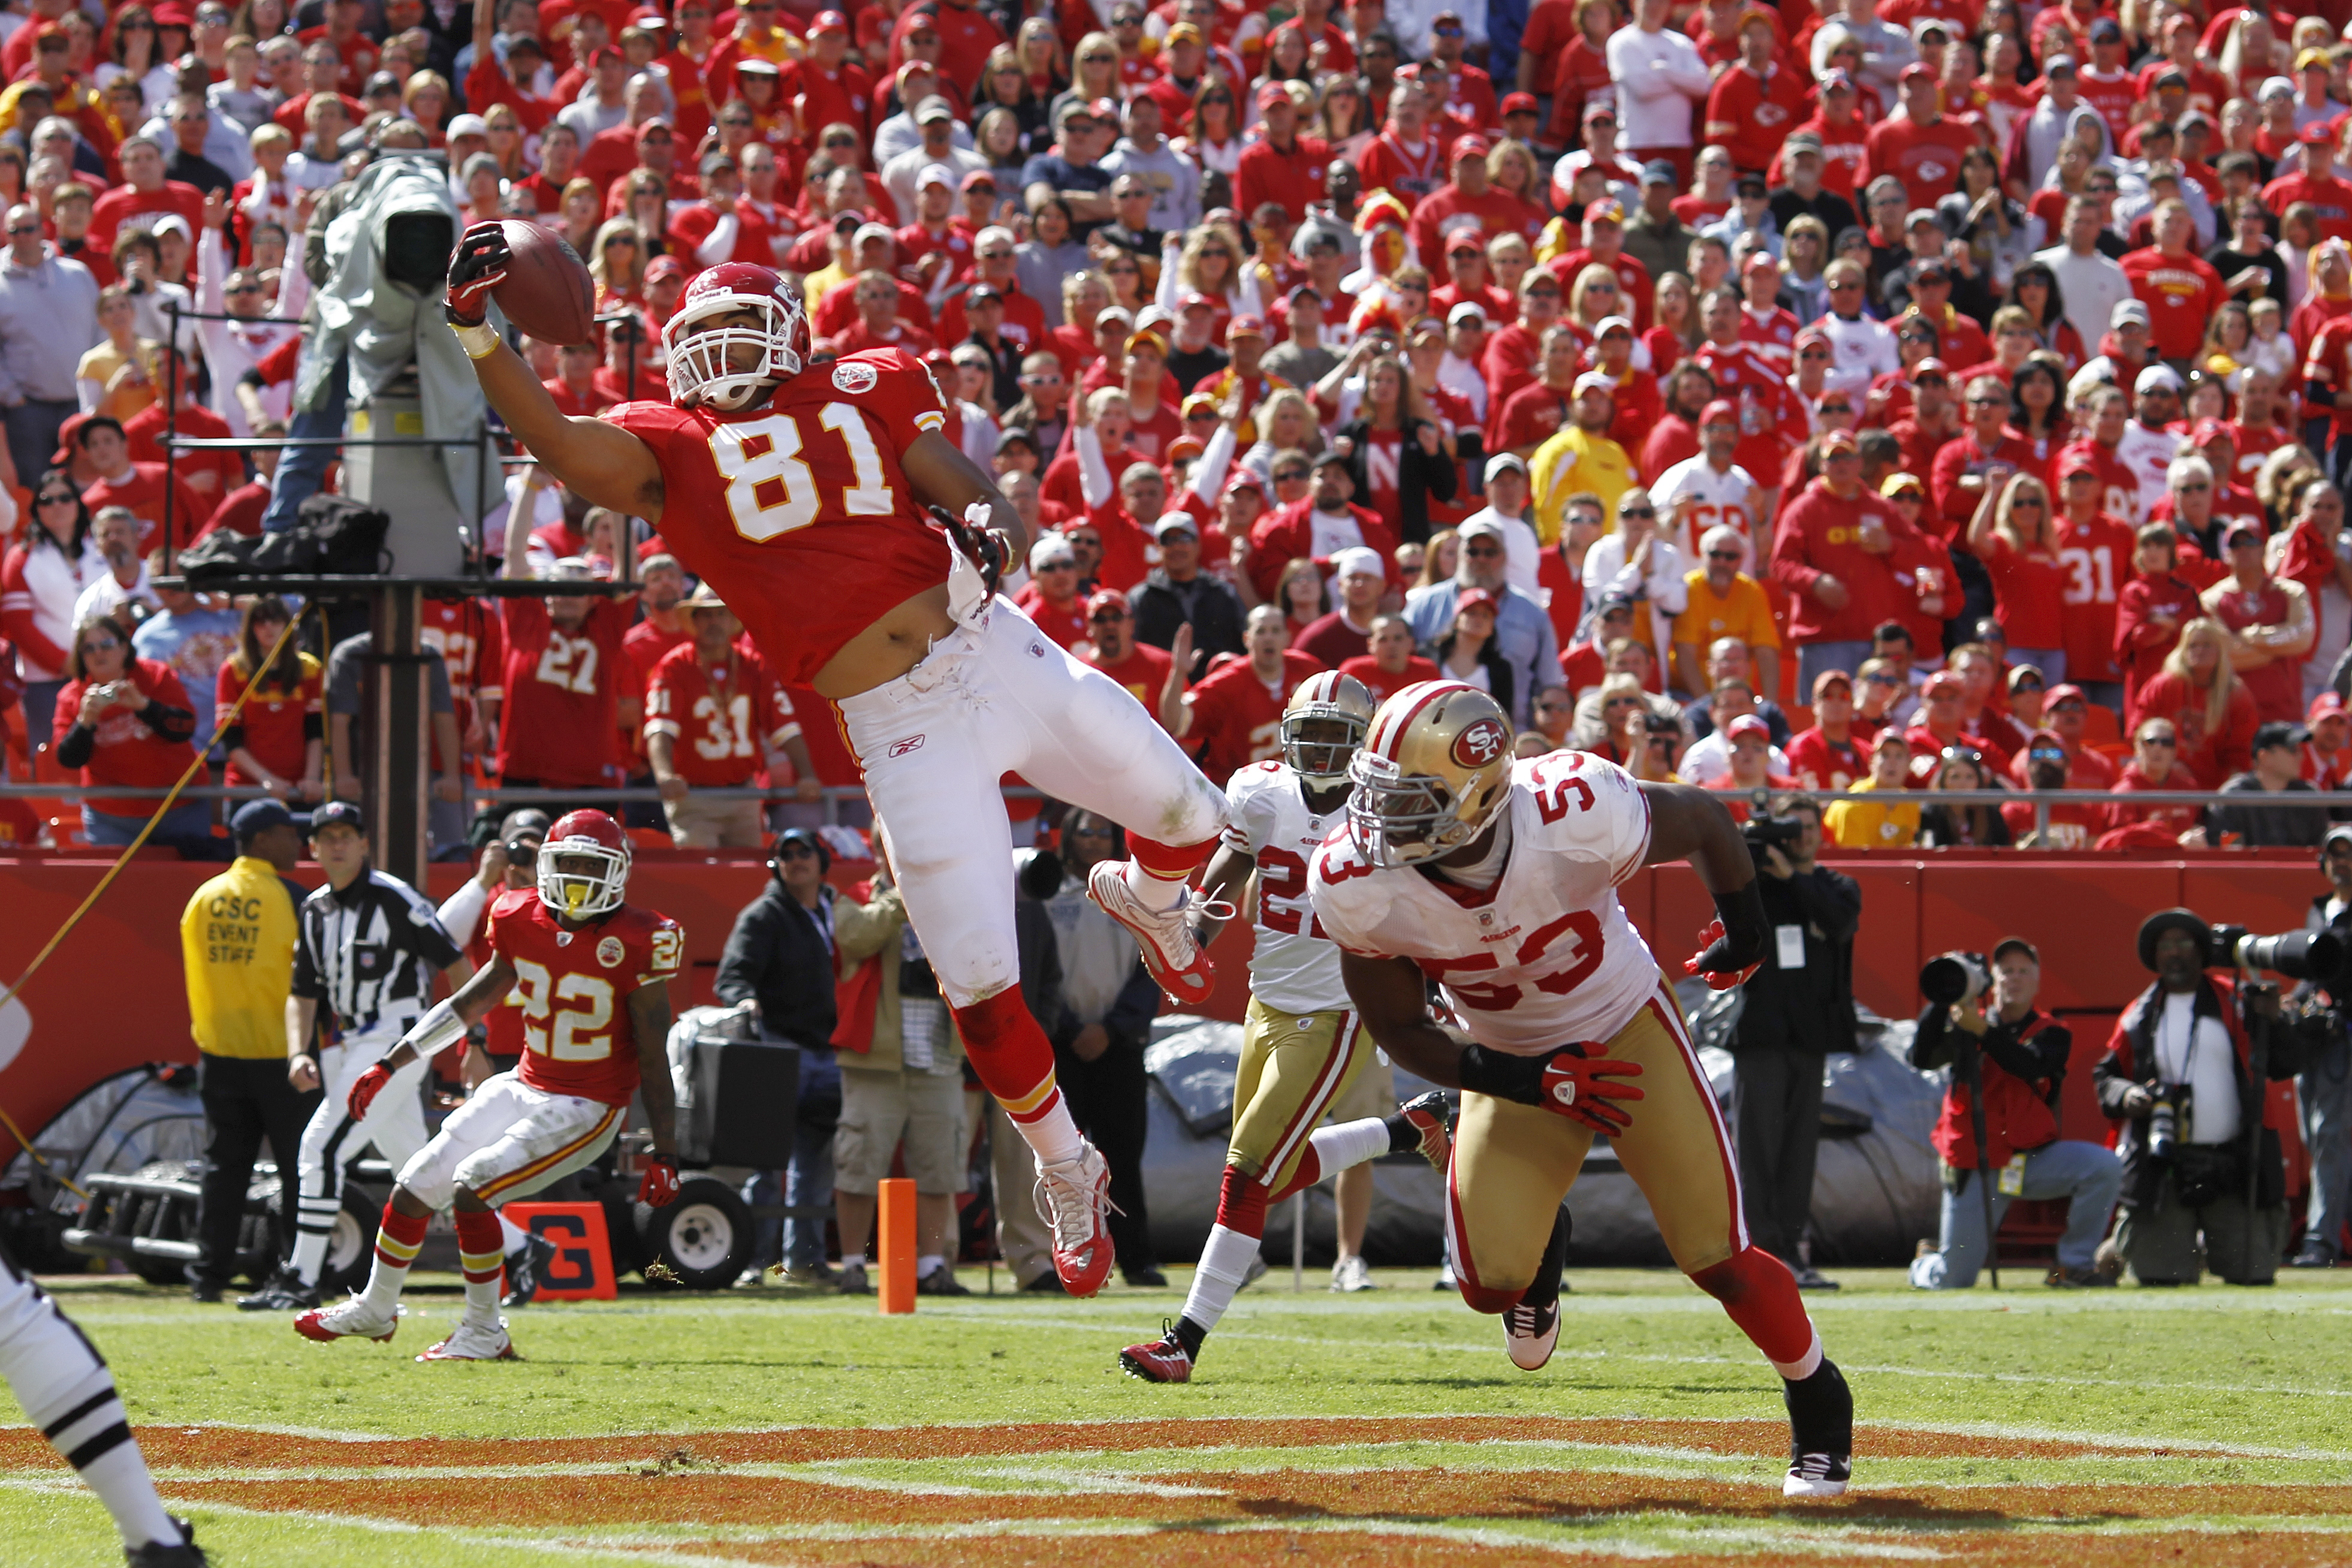 KANSAS CITY, MO - SEPTEMBER 26: Tony Moeaki #81 of the Kansas City Chiefs makes a one-handed 18-yard touchdown catch behind NaVorro Bowman #53 of the San Francisco 49ers at Arrowhead Stadium on September 26, 2010 in Kansas City, Missouri. The Chiefs won 3